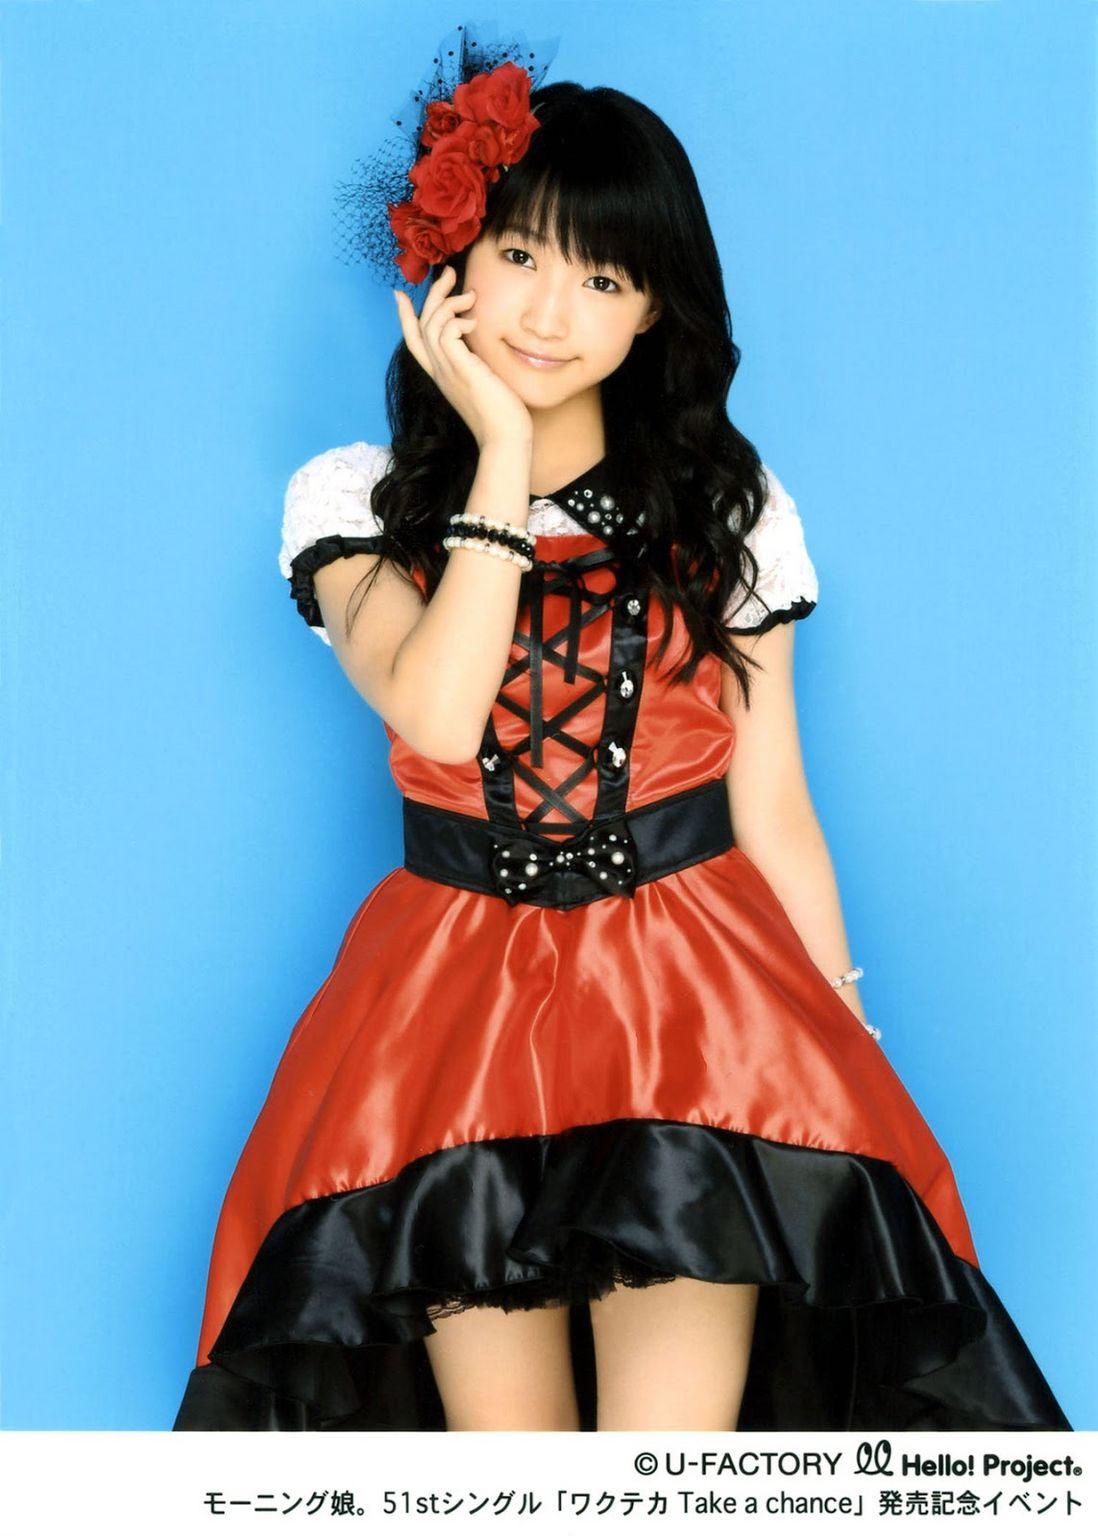 Morning Musume Sayashi Riho Wakuteka Take A Chance Photos 4